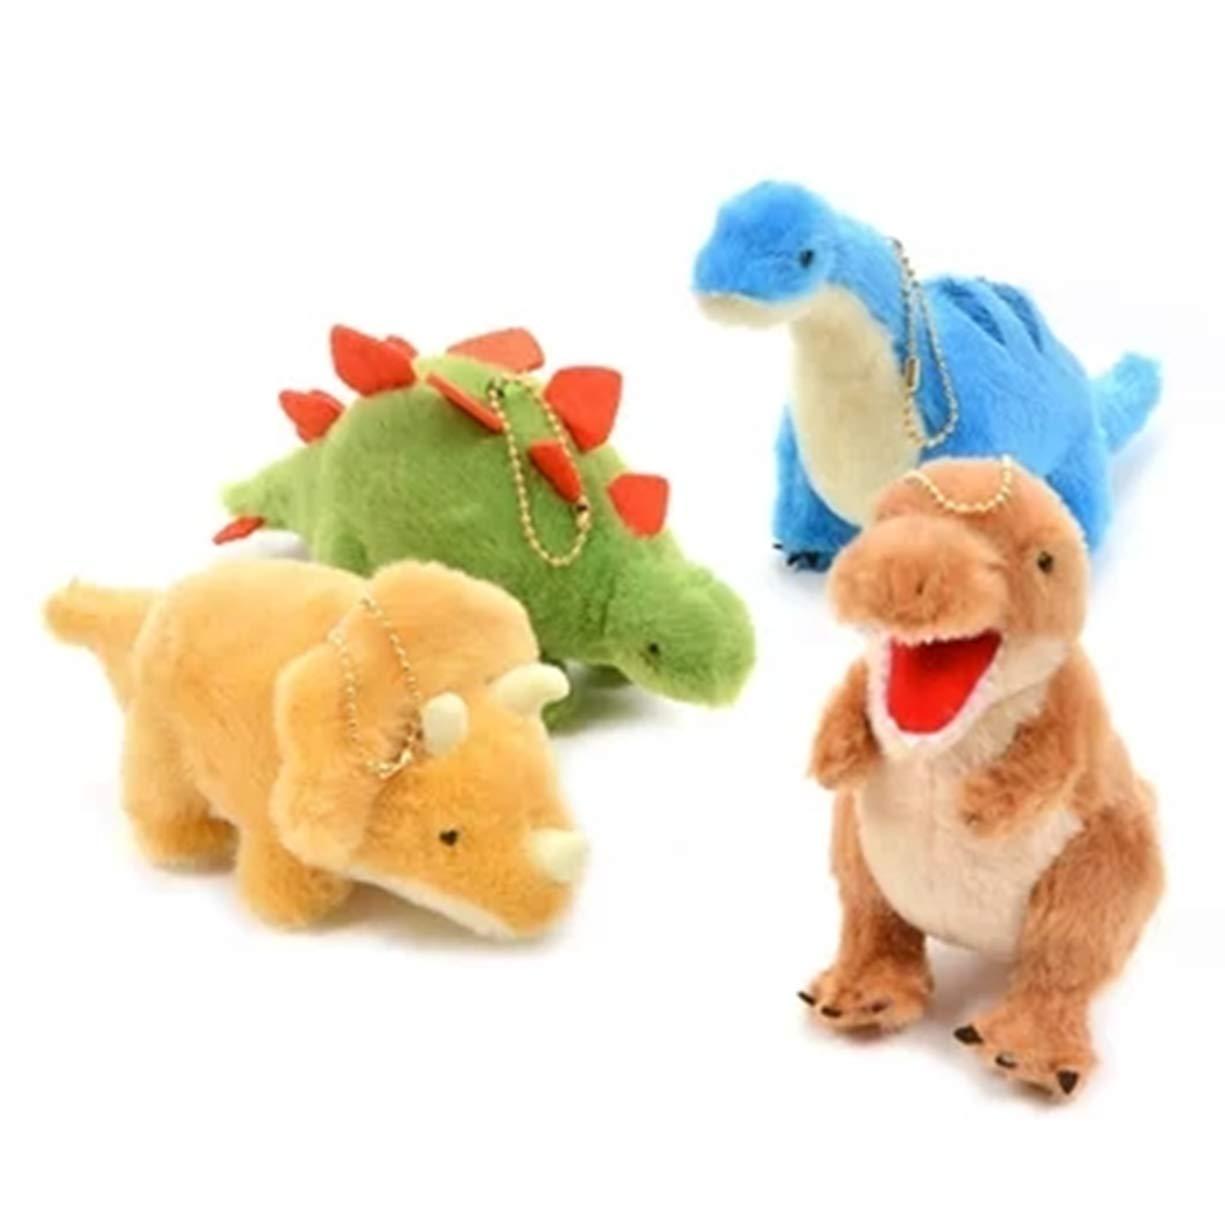 Amazon.com: Amuse Dinosaur - Peluche de peluche ...